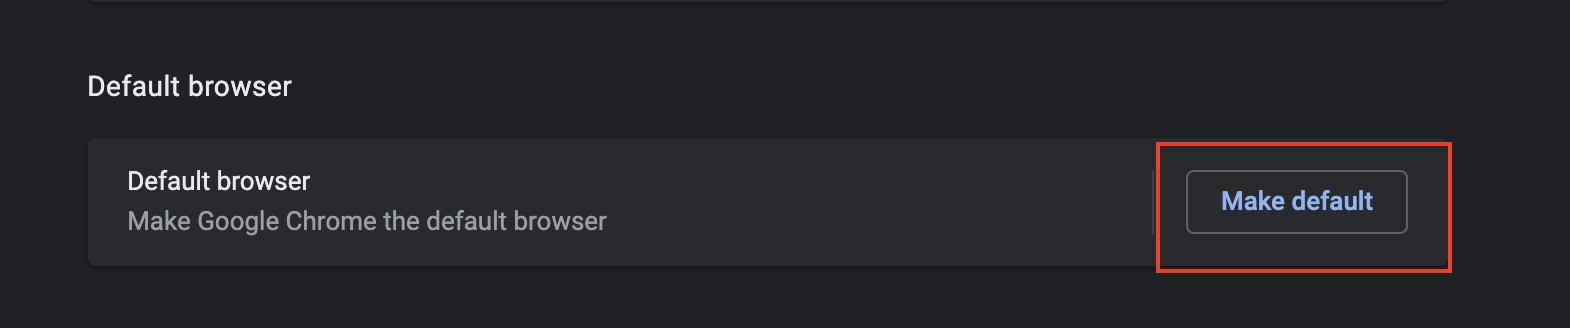 default chrome browser